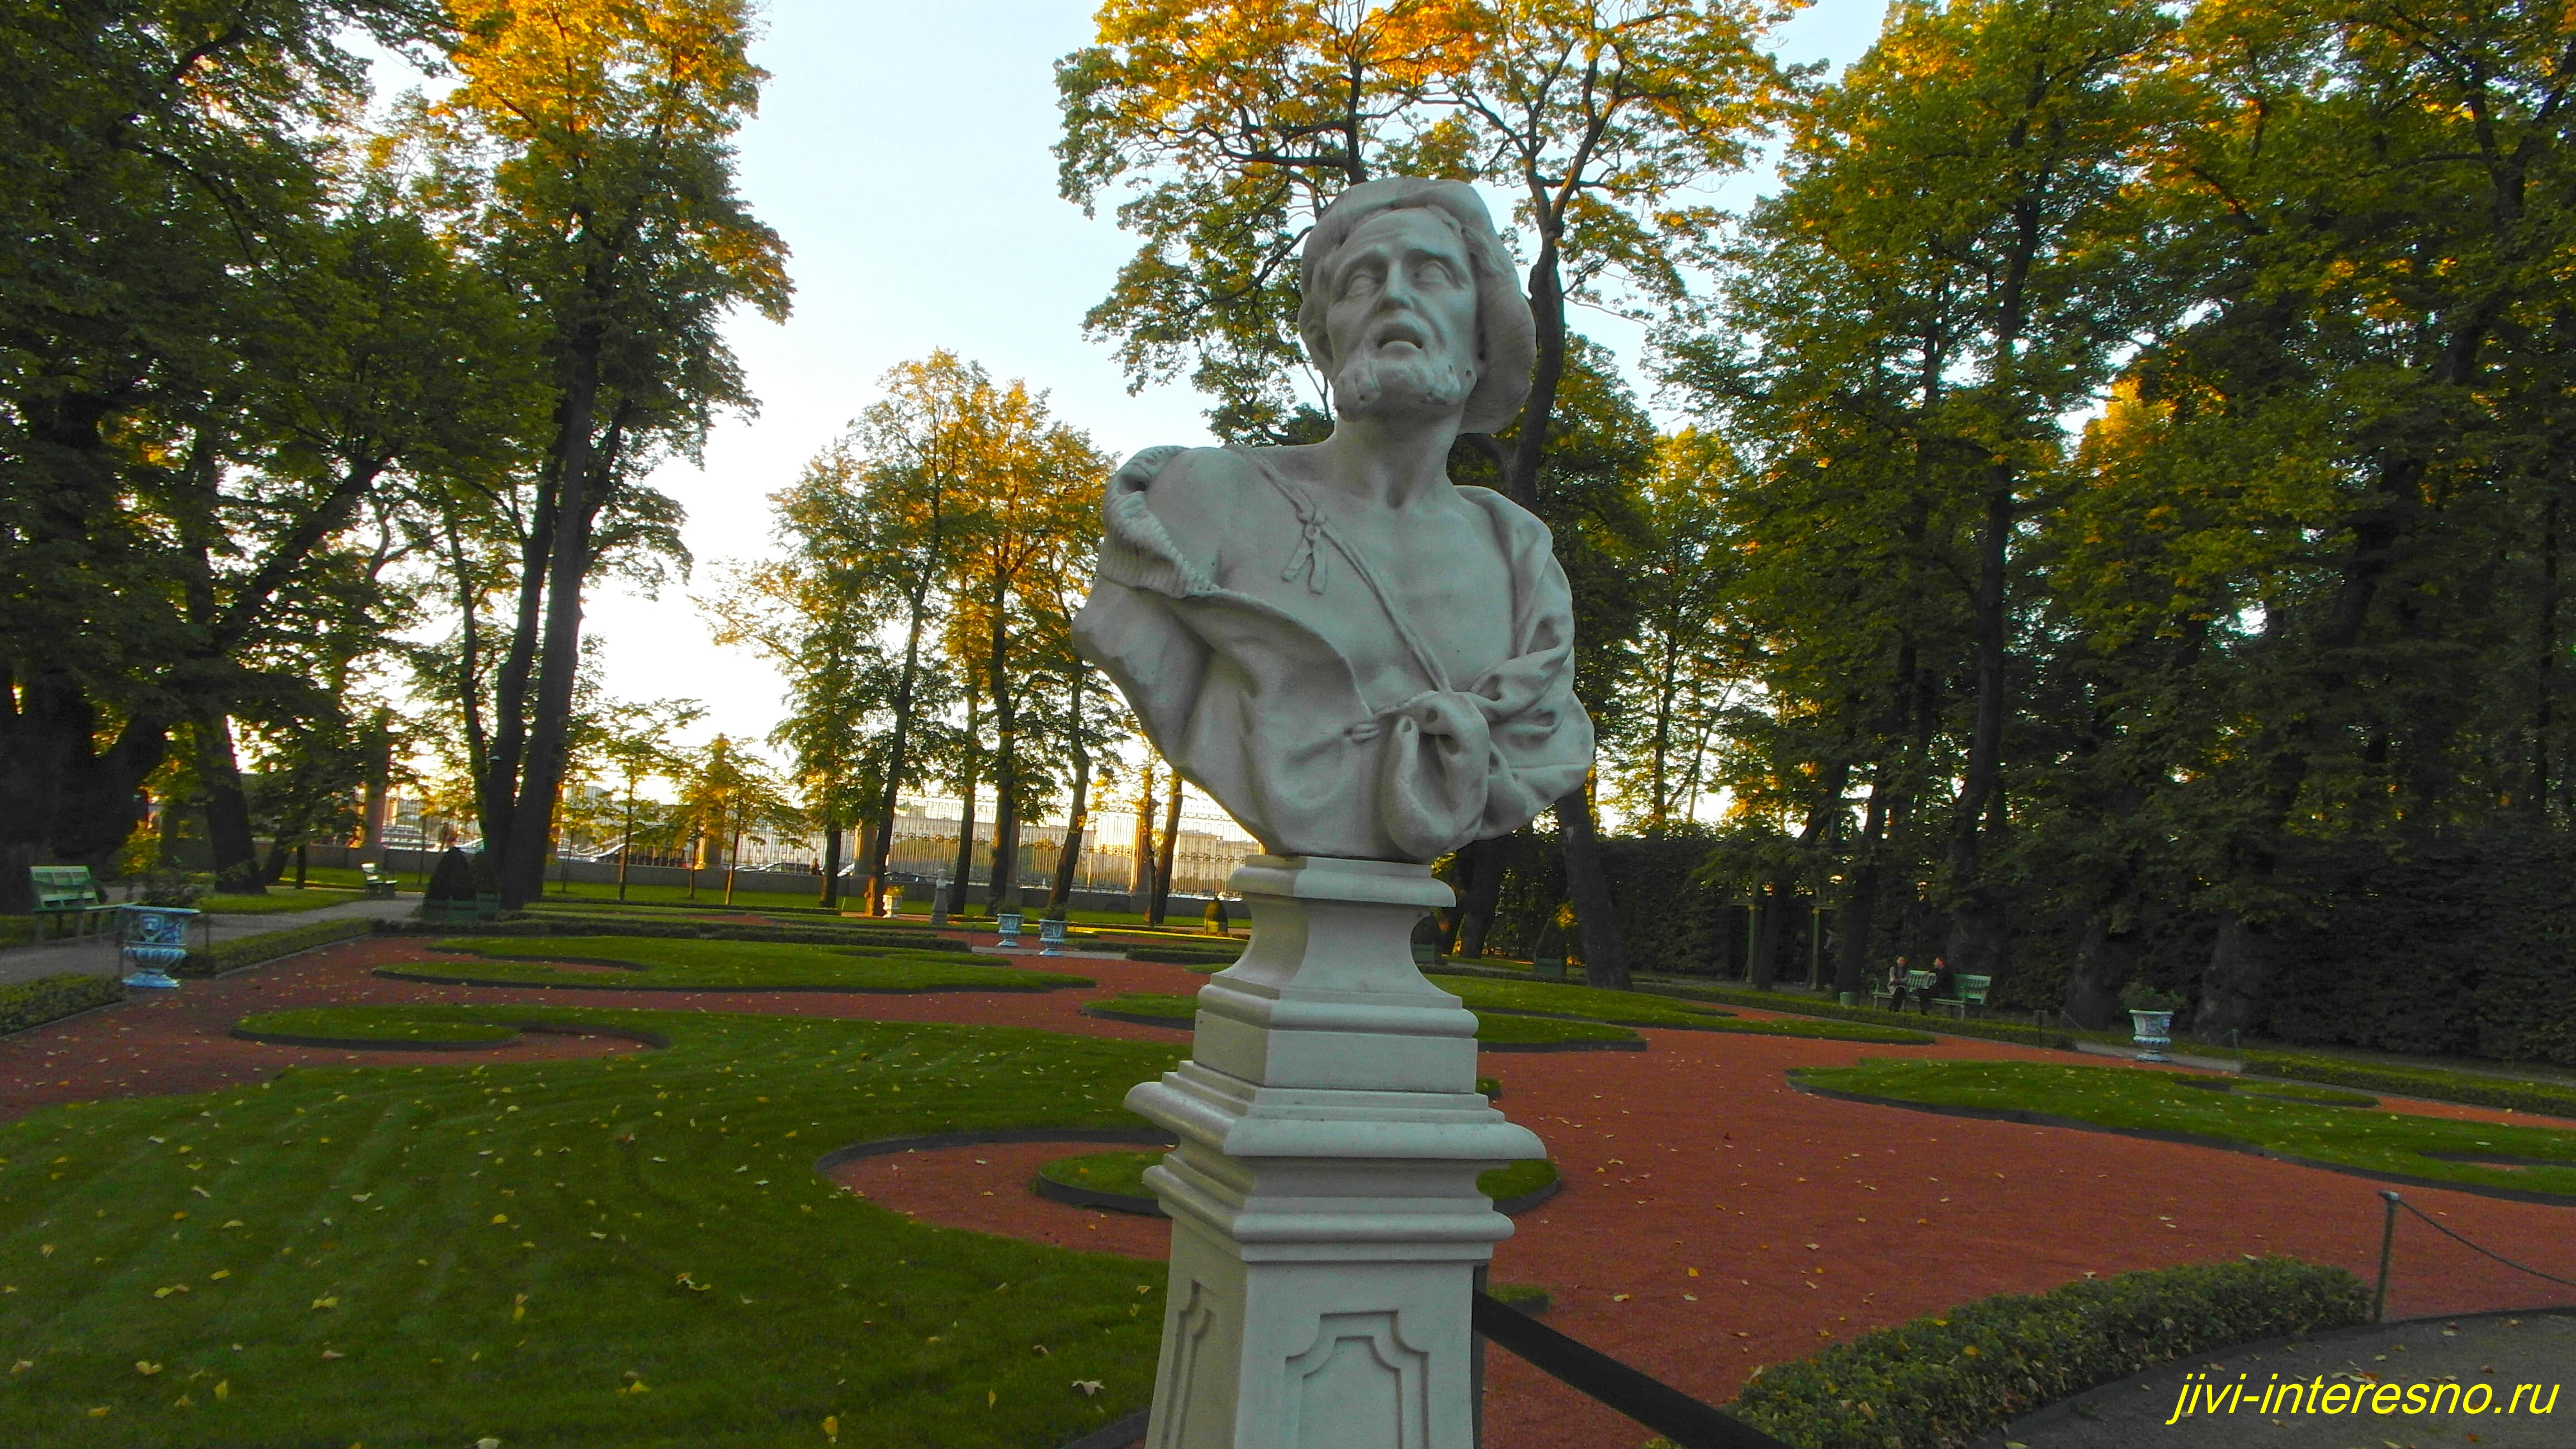 Сентябрь в Летнем саду, Бюст Диогена